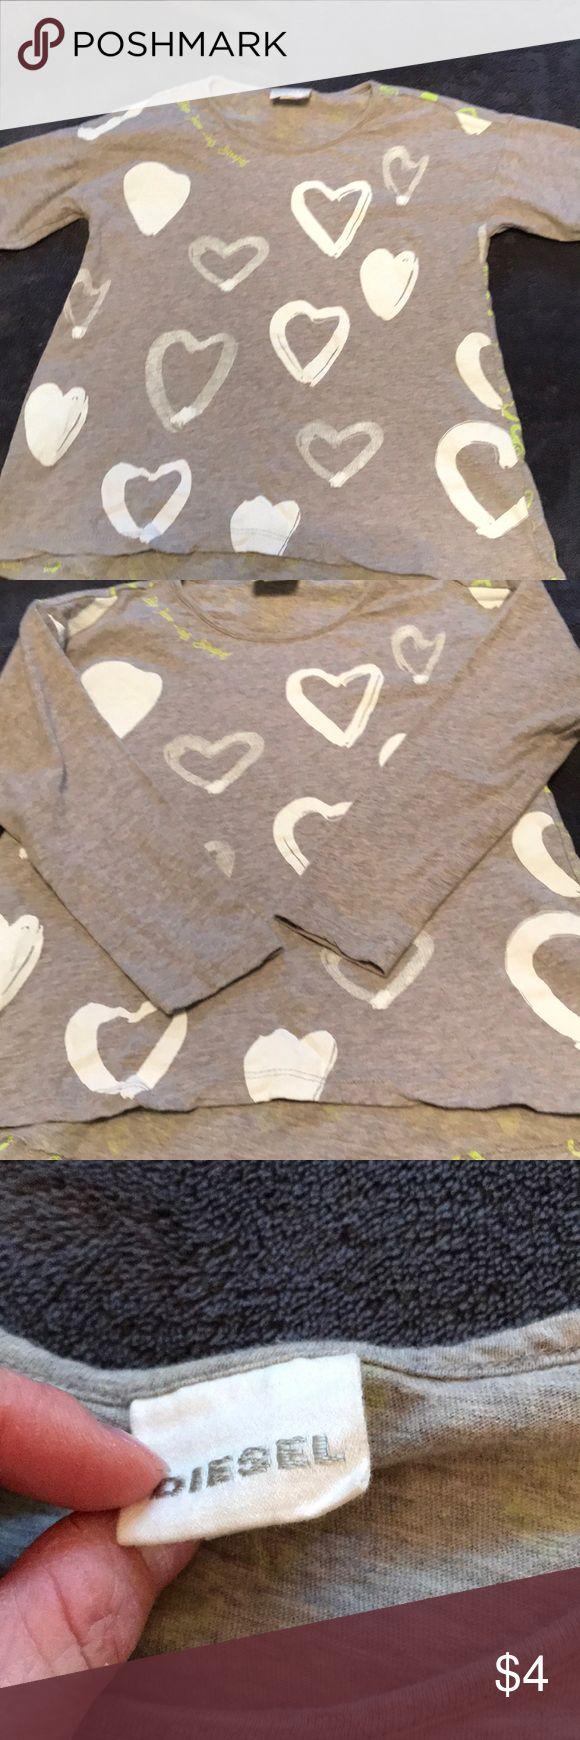 Diesel shirt Diesel shirt in girls xxs, shirt is in good used condition Diesel Shirts & Tops Tees - Long Sleeve